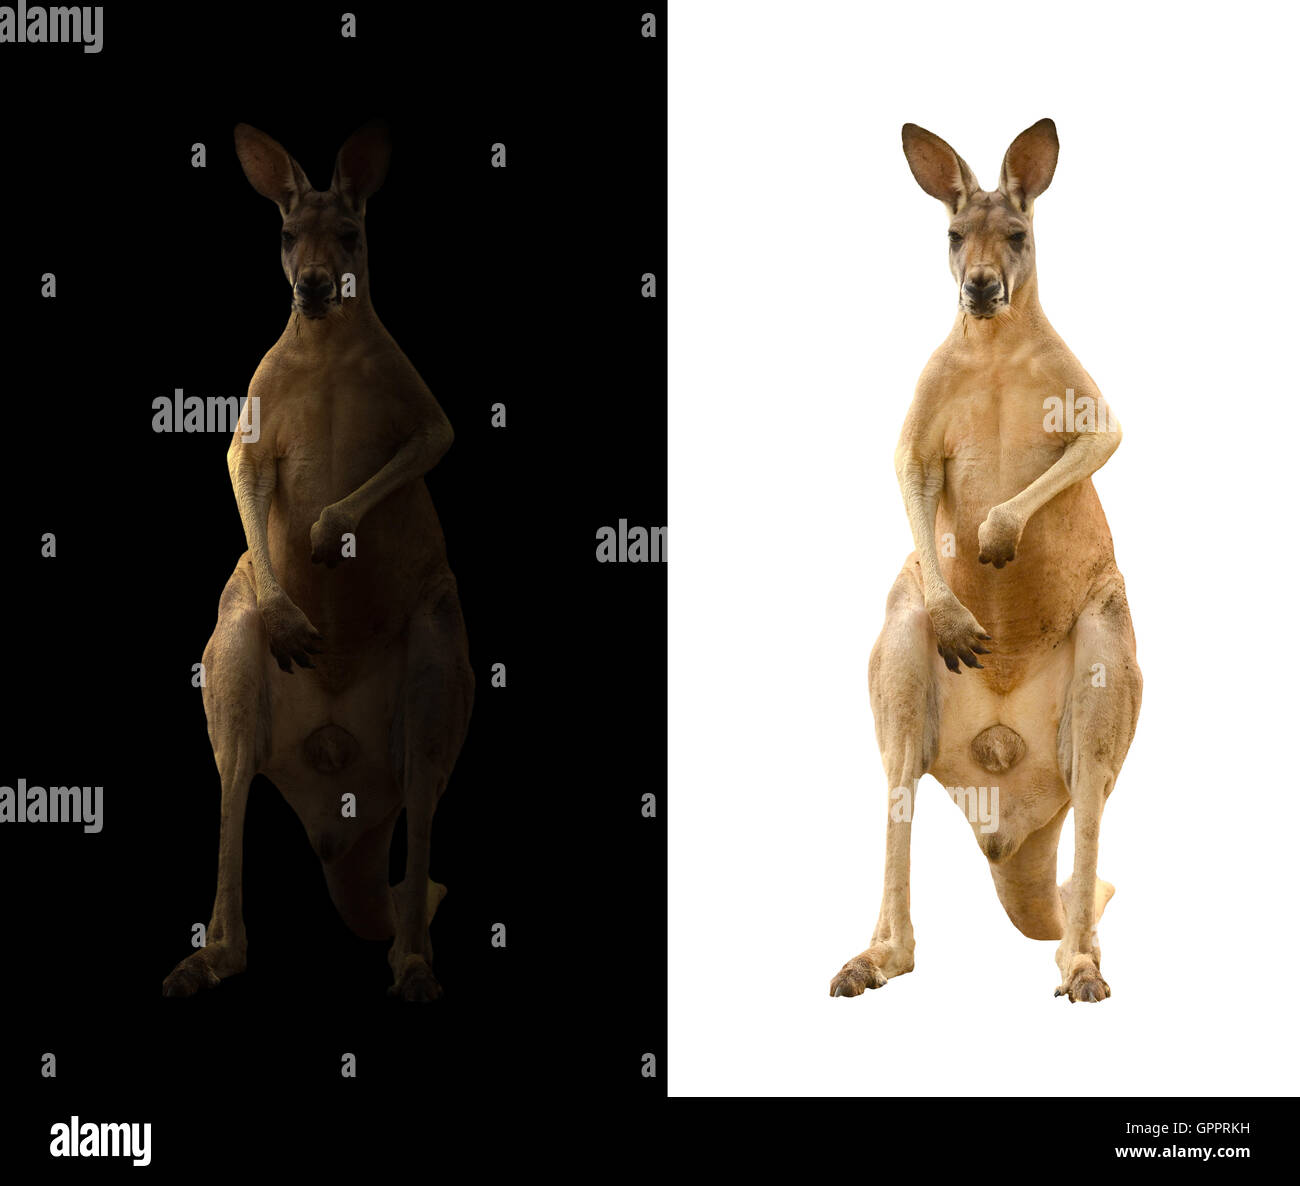 Kangaroo isolato e kangaroo nel buio Immagini Stock